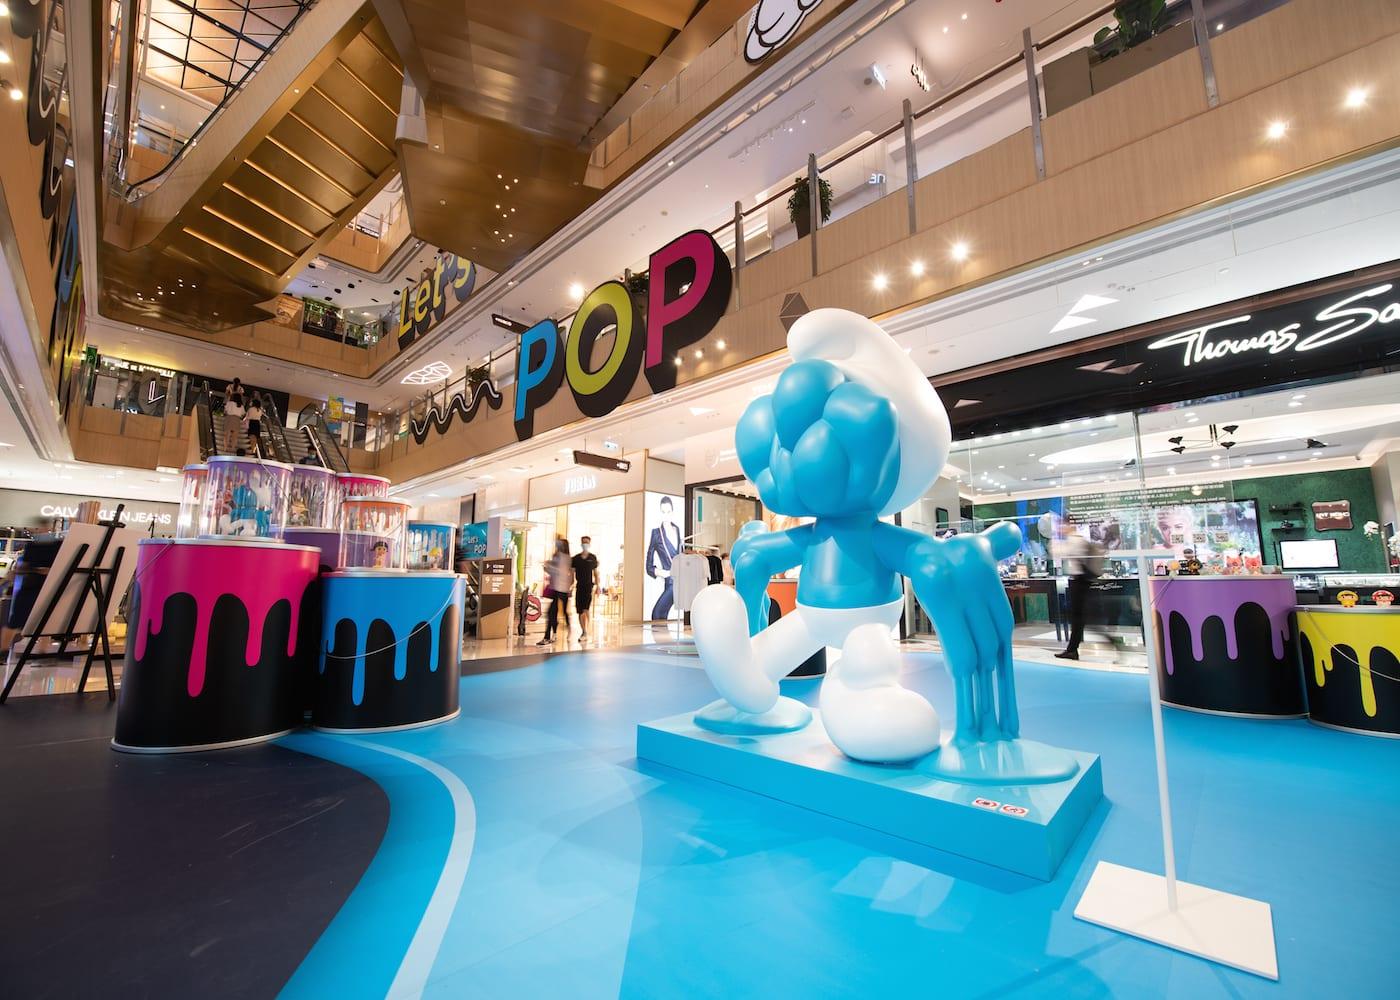 LET'S POP! K11 x STREAMS Pop-up Store